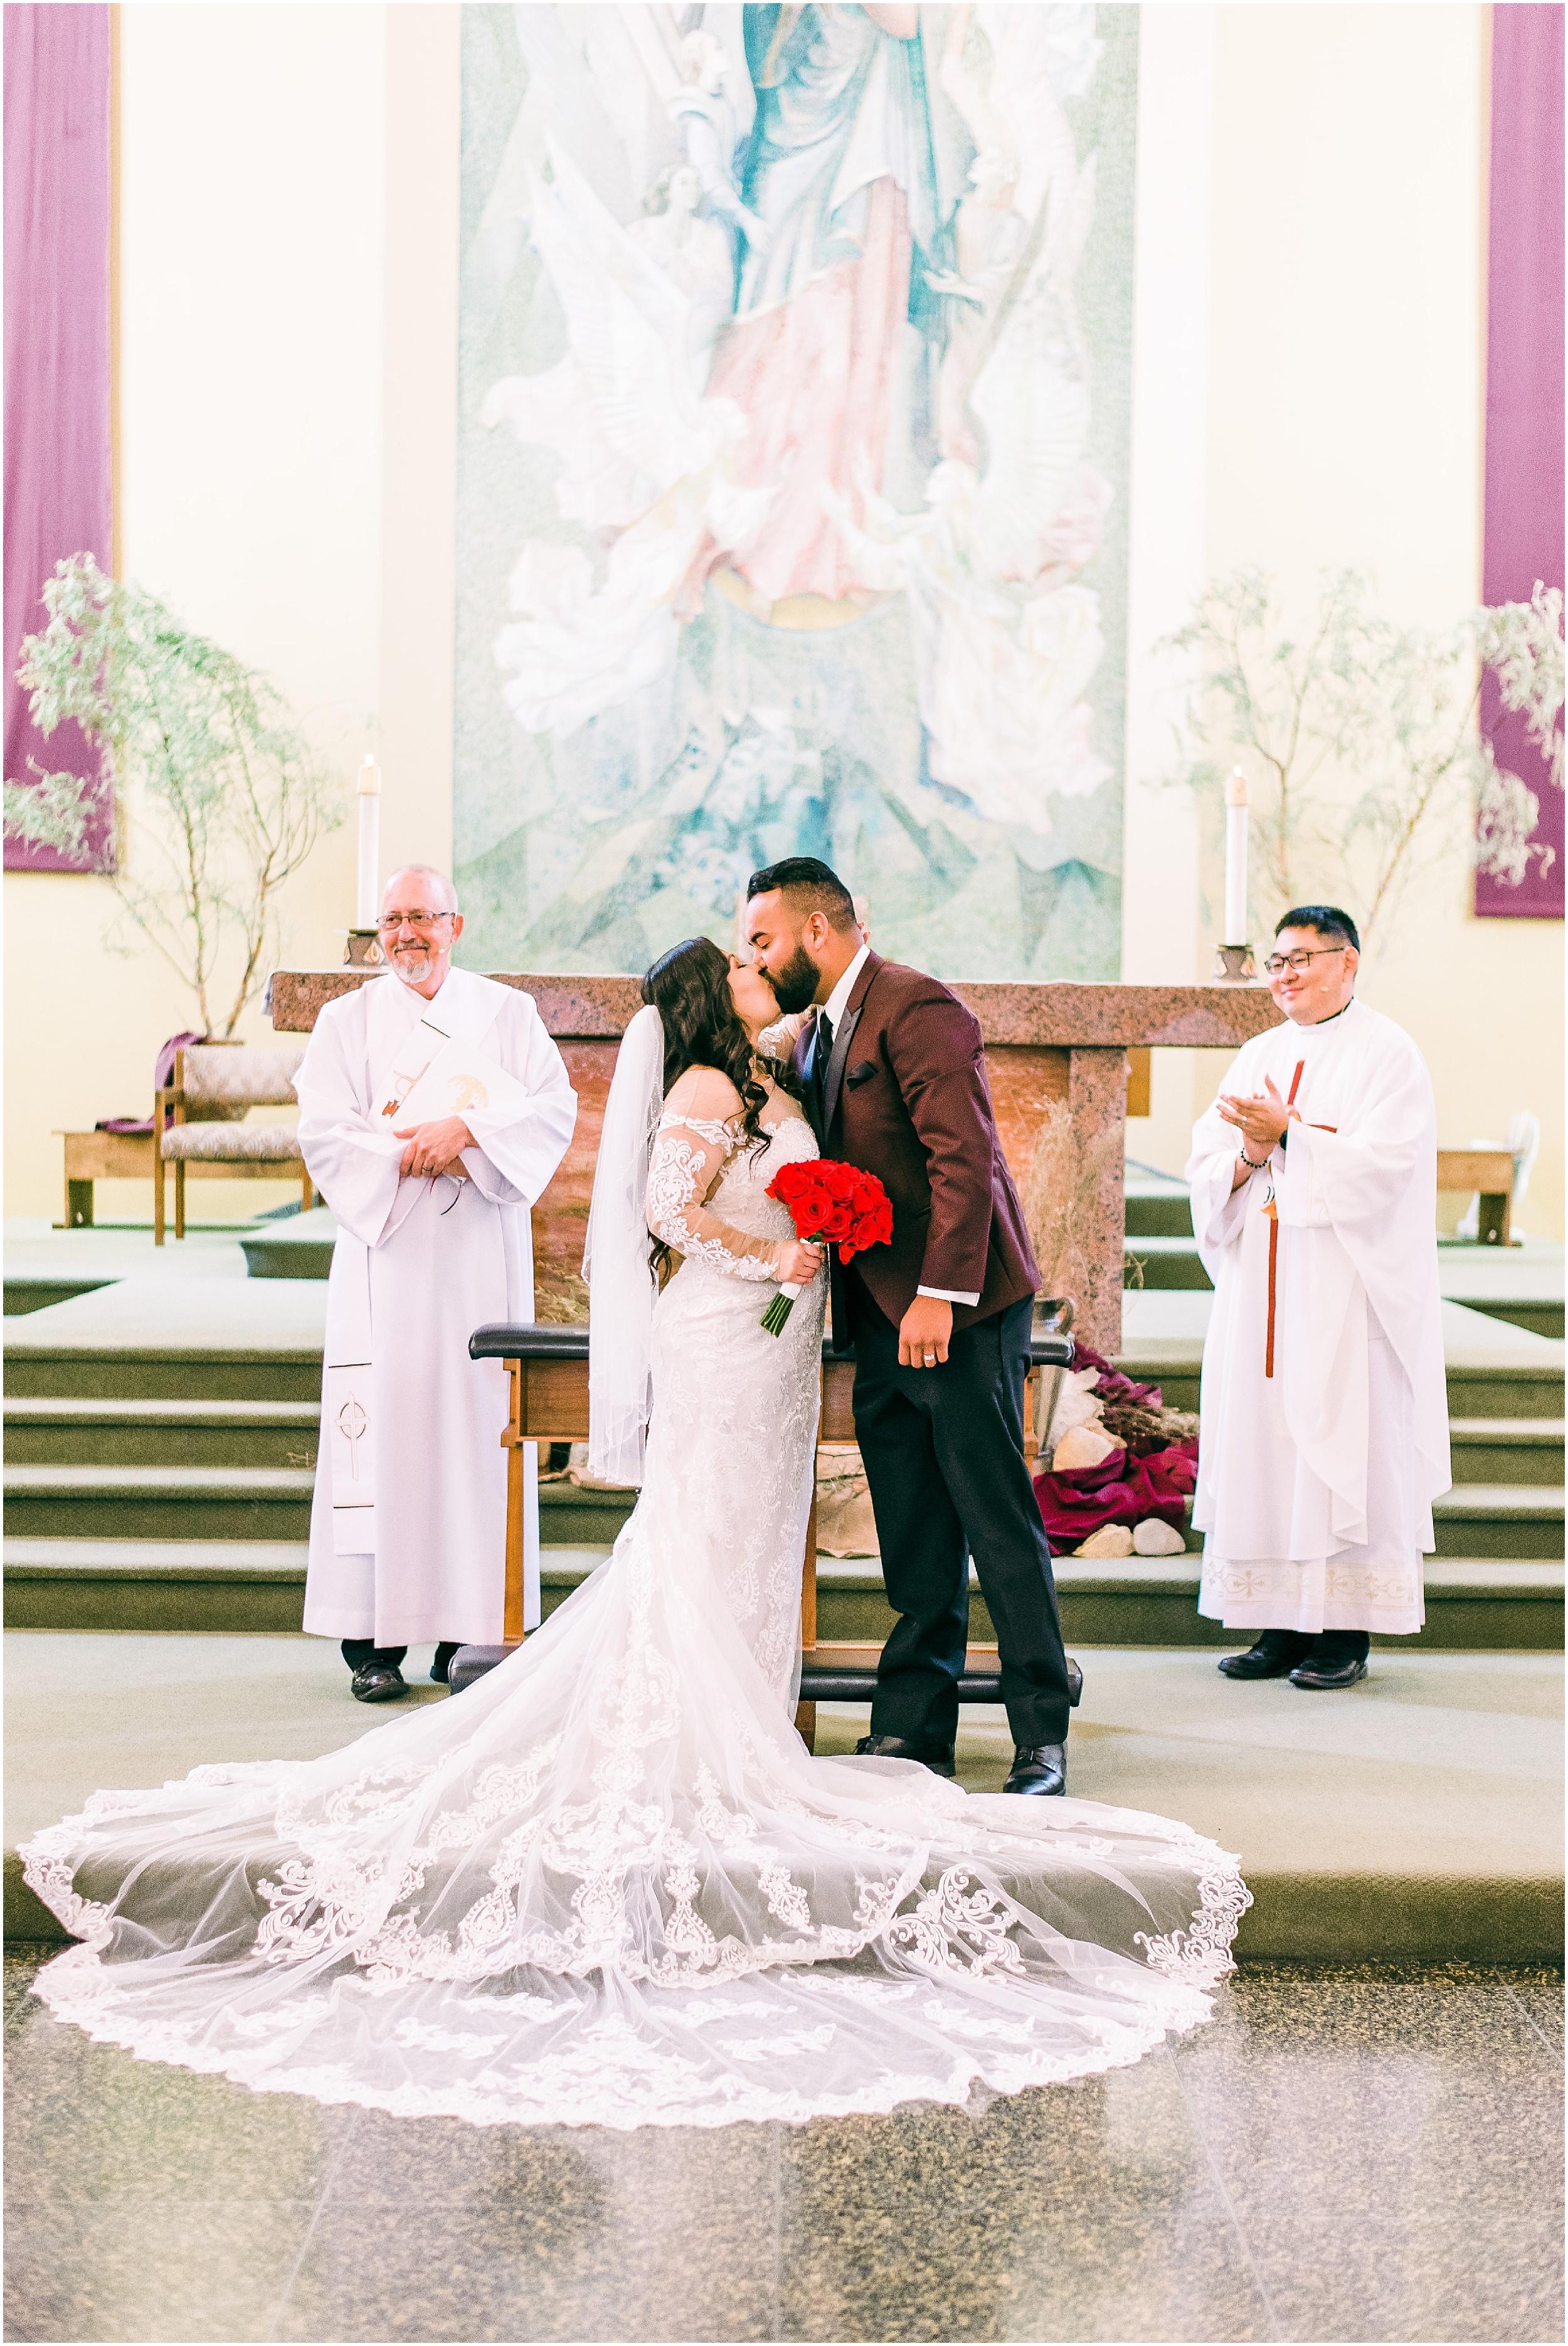 Ventura-California-and-Tallahassee-Florida-Wedding-Photographer-Crystal-and-Daniel-Wedding-at-Westlake-California_0020.jpg